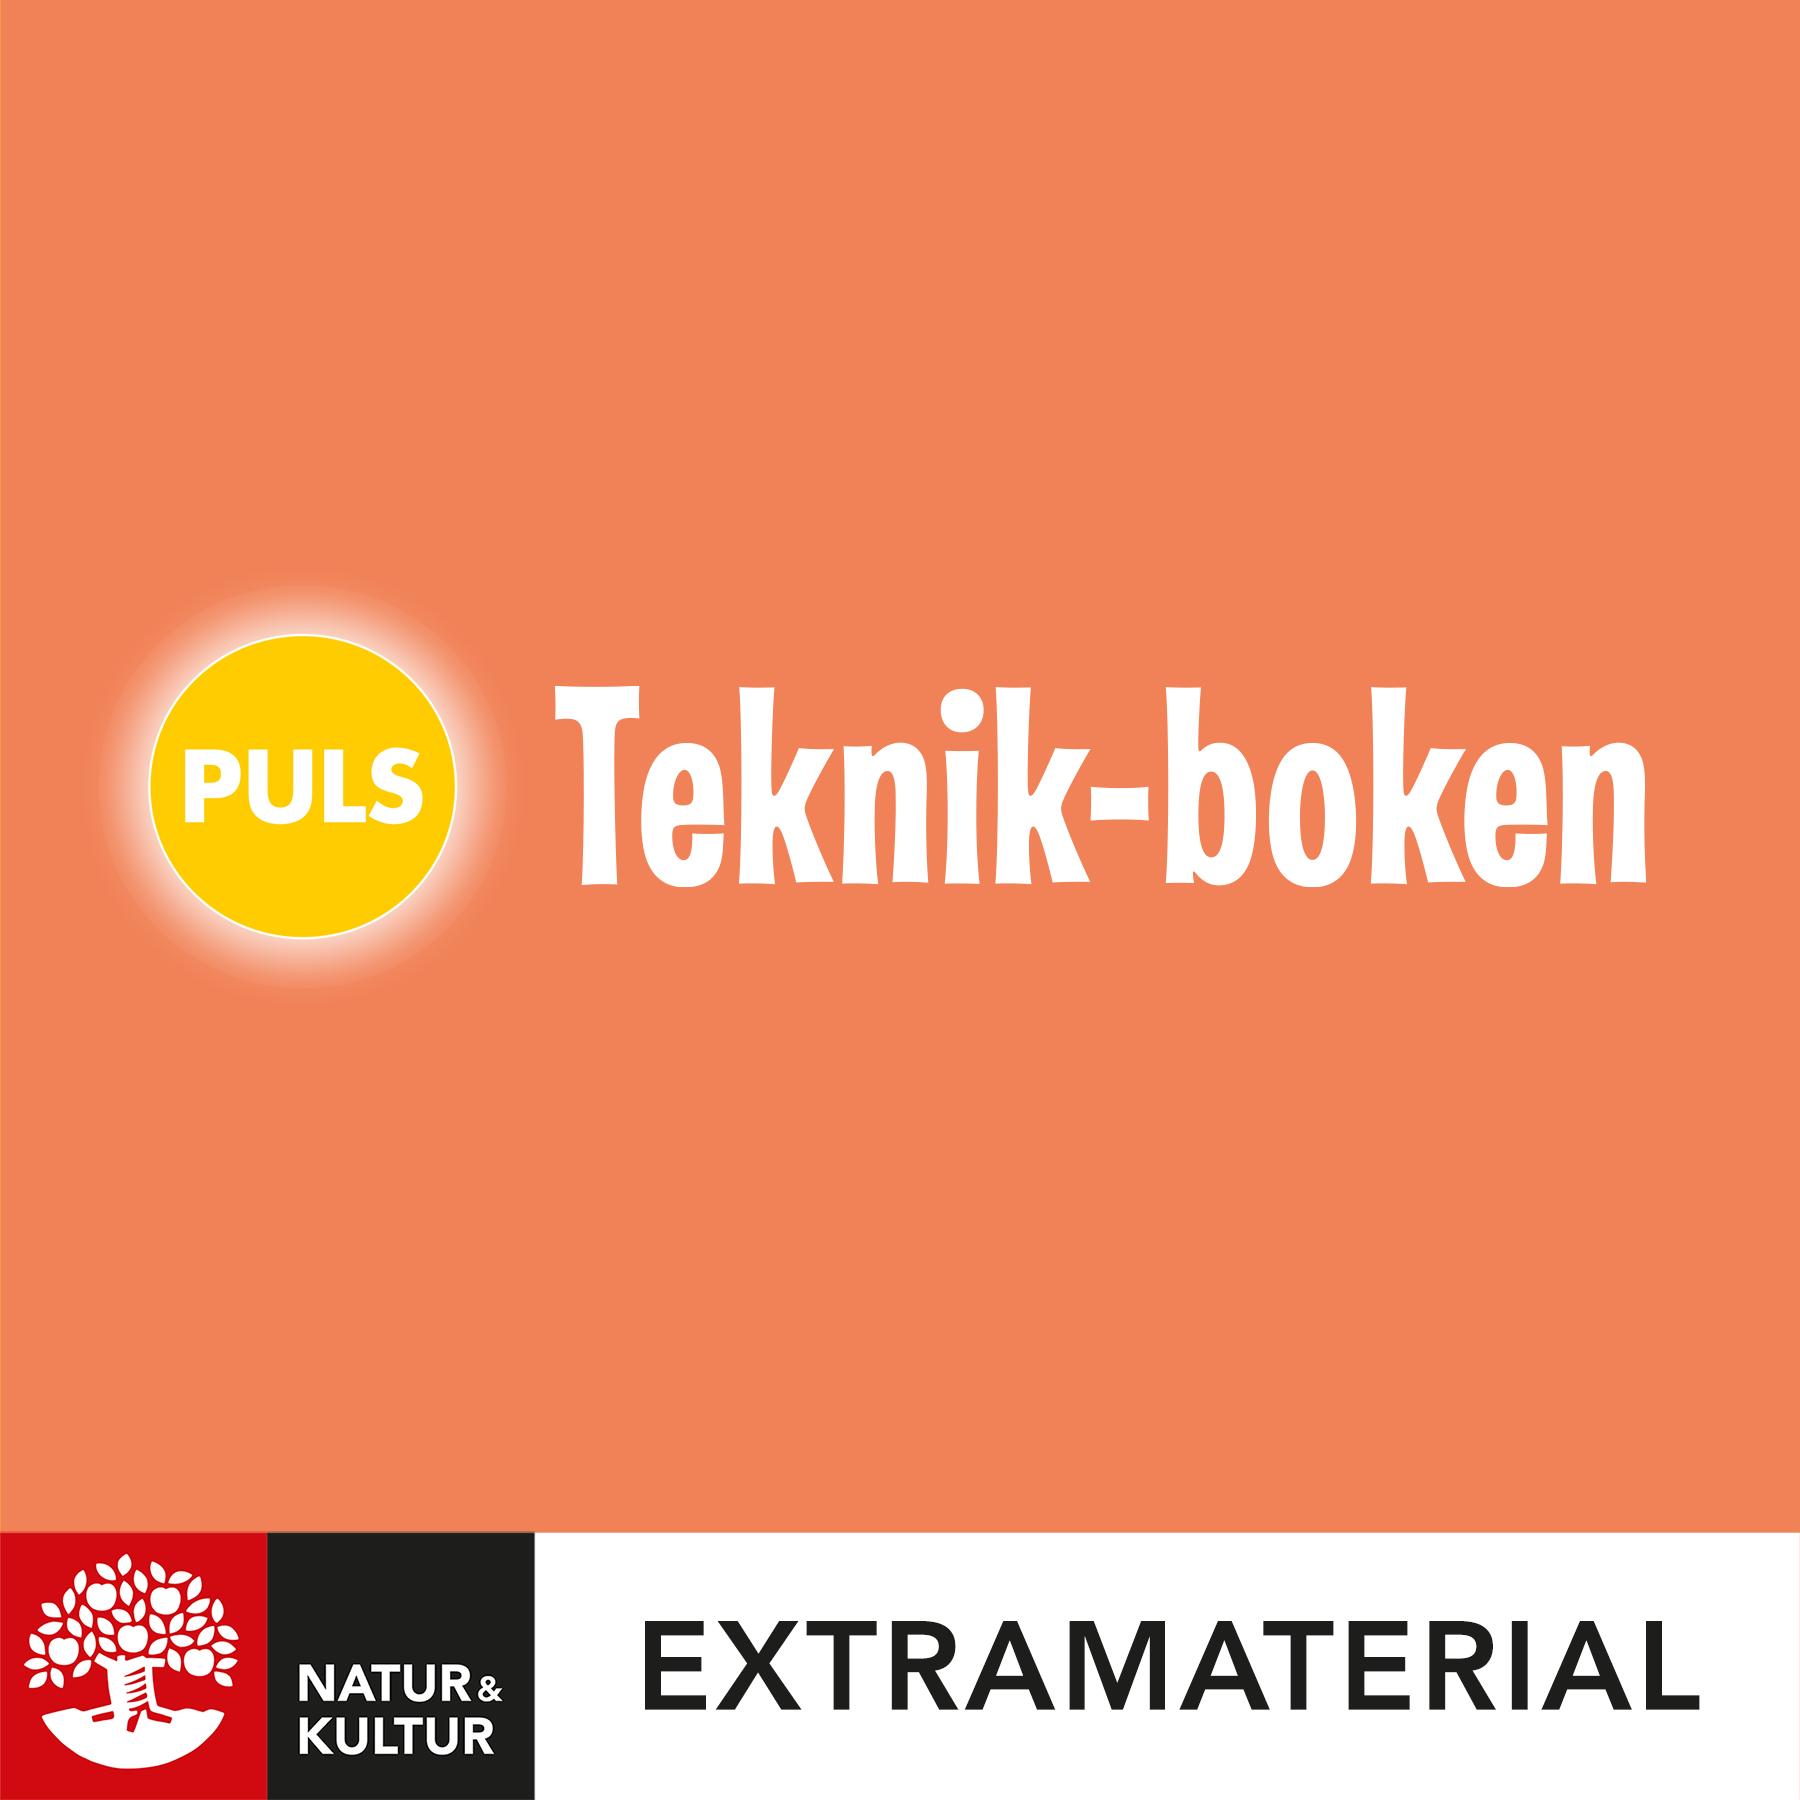 PULS 1-3 Teknik-boken